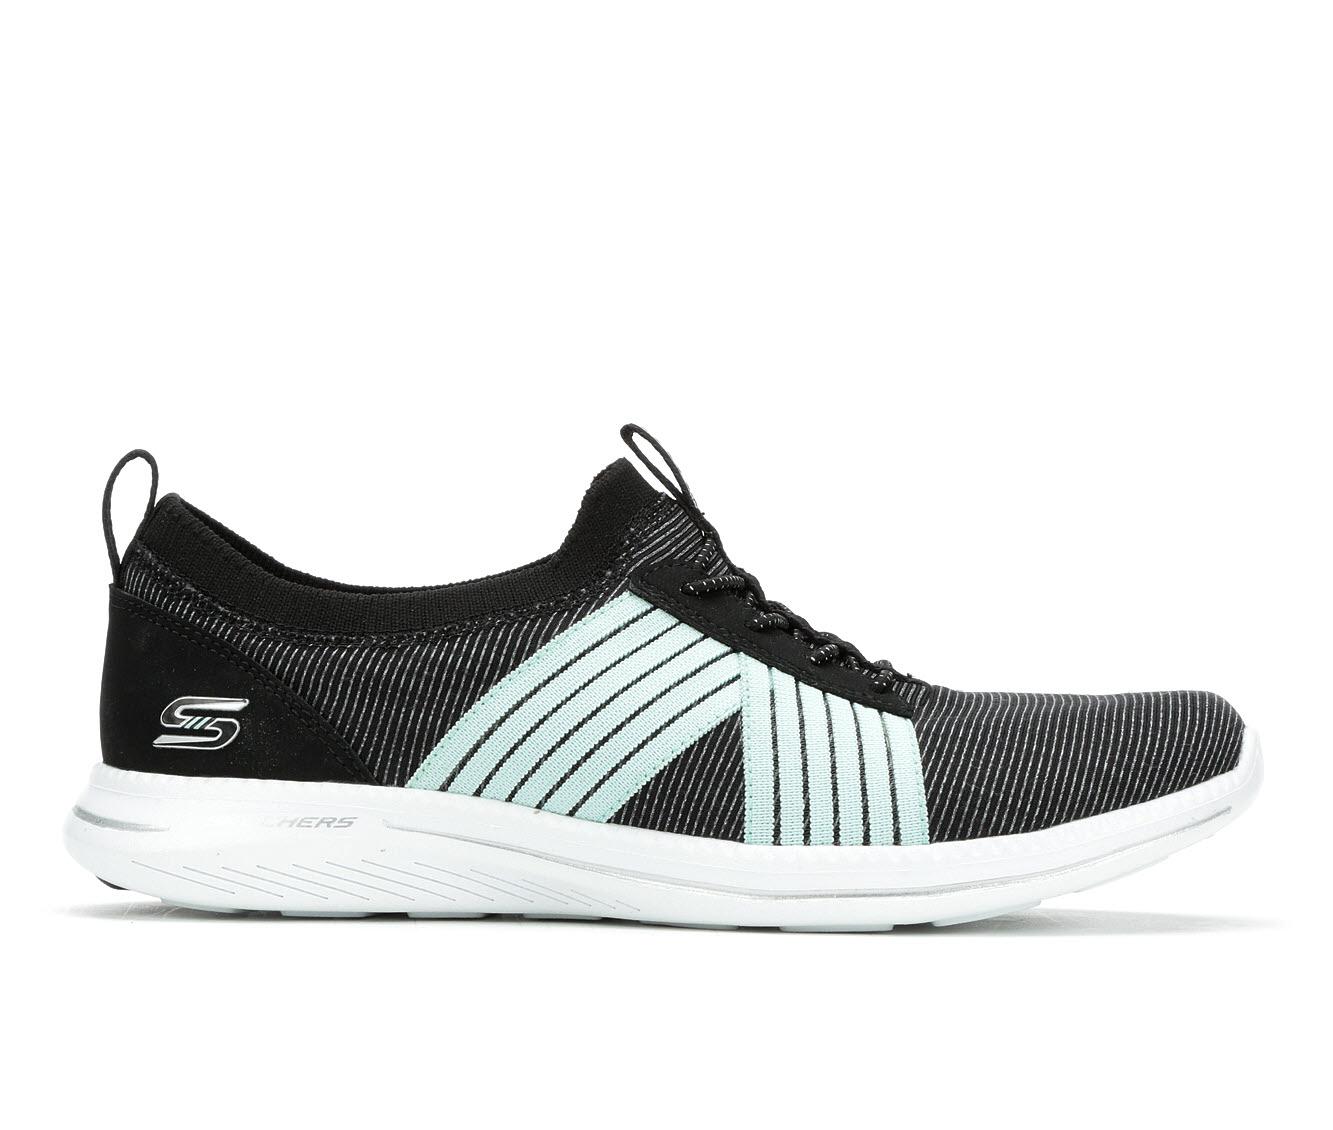 Skechers City Pro 23748 Women's Athletic Shoe (Black)